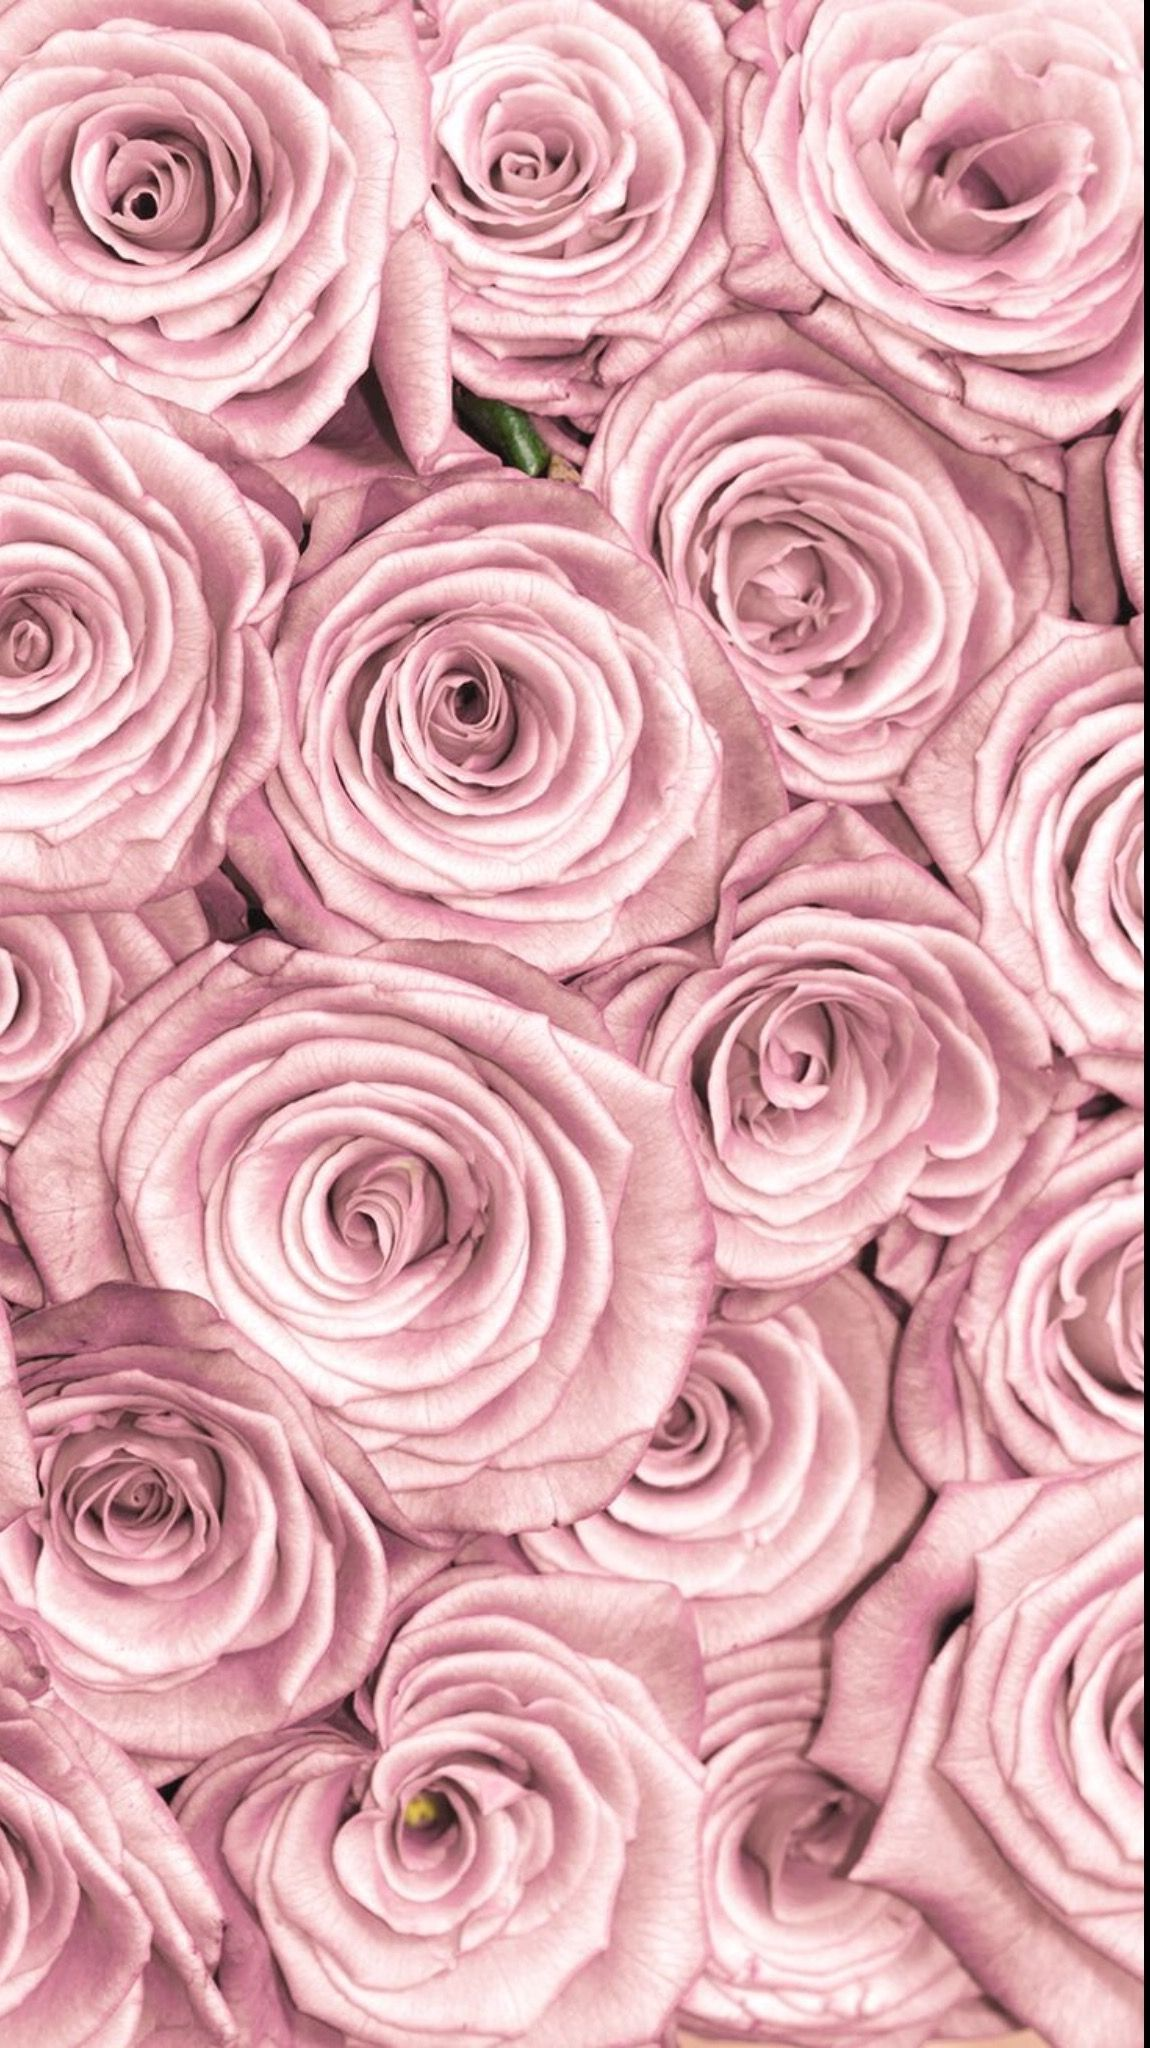 Flowers Lockscreen Rose Gold Rose Gold Wallpapers Pinterest Rose Gold Wallpaper Iphone Gold Wallpaper Iphone Gold Wallpaper Background